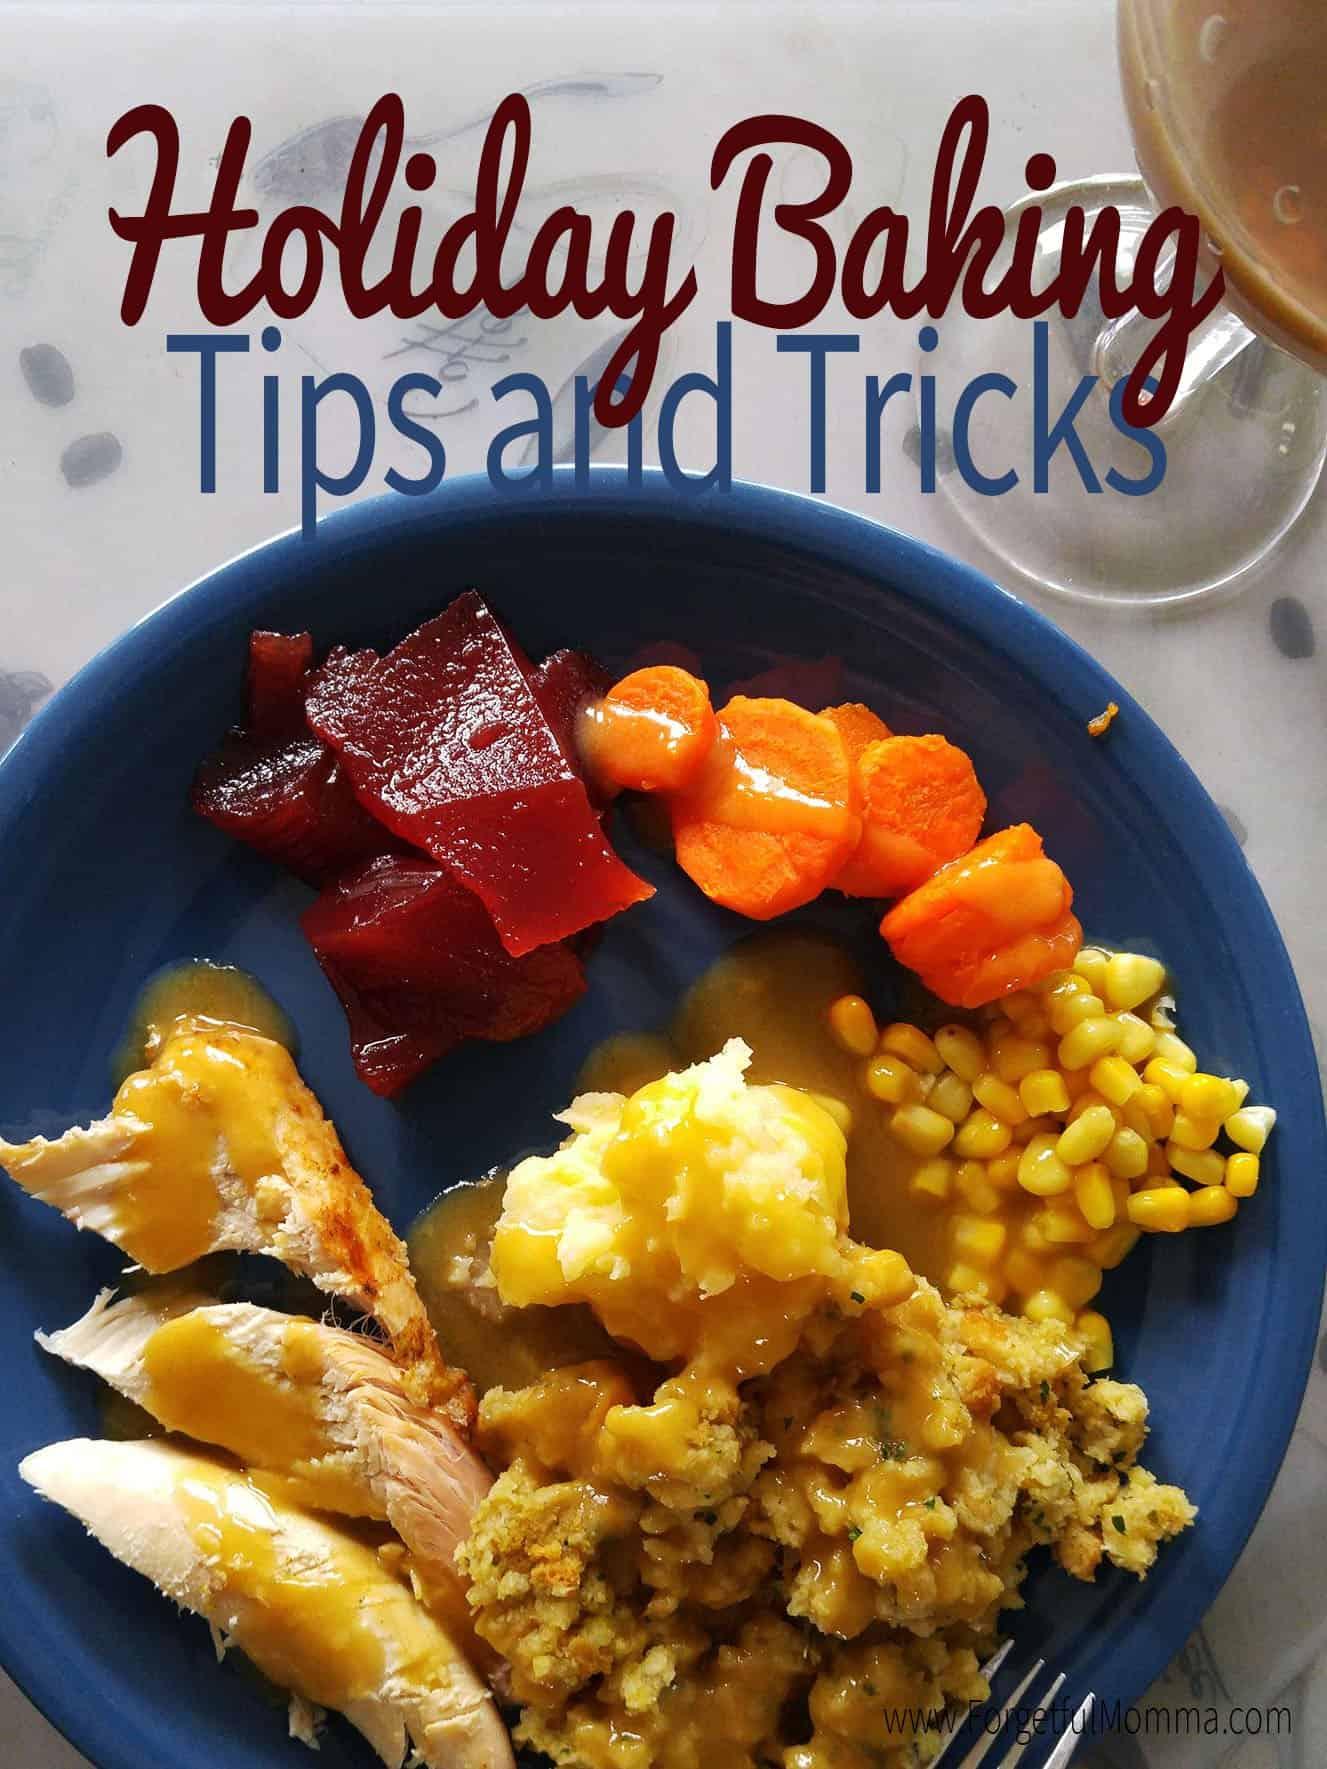 Holiday Baking Tips and Tricks